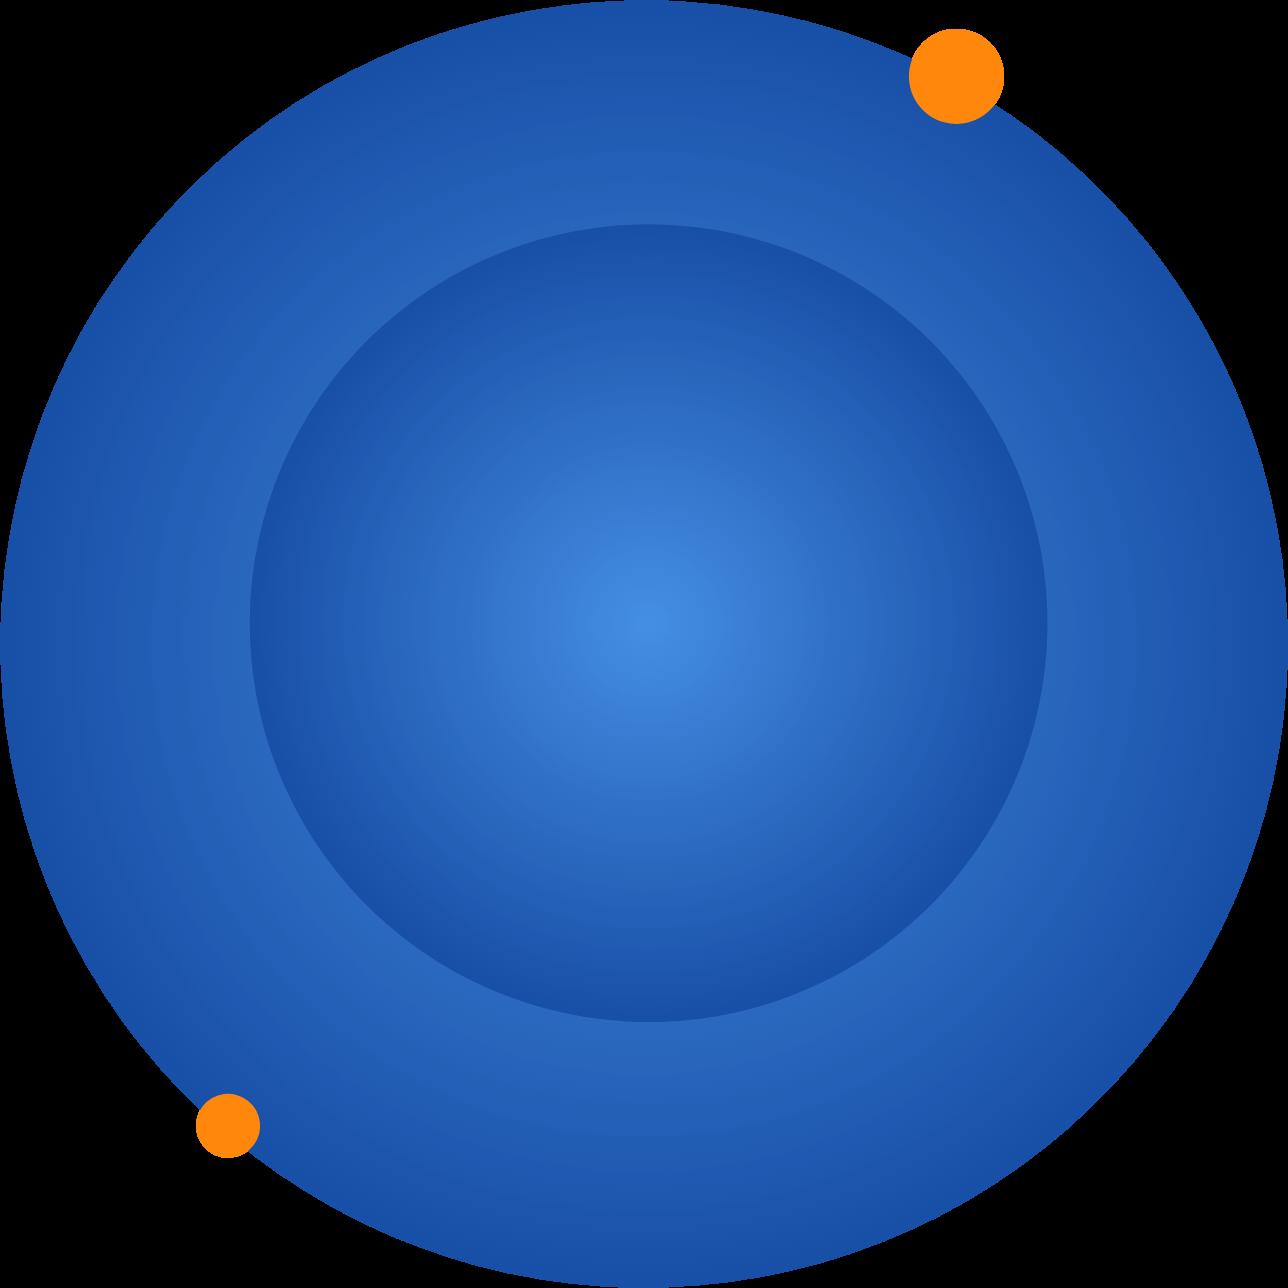 Big Round Image 3